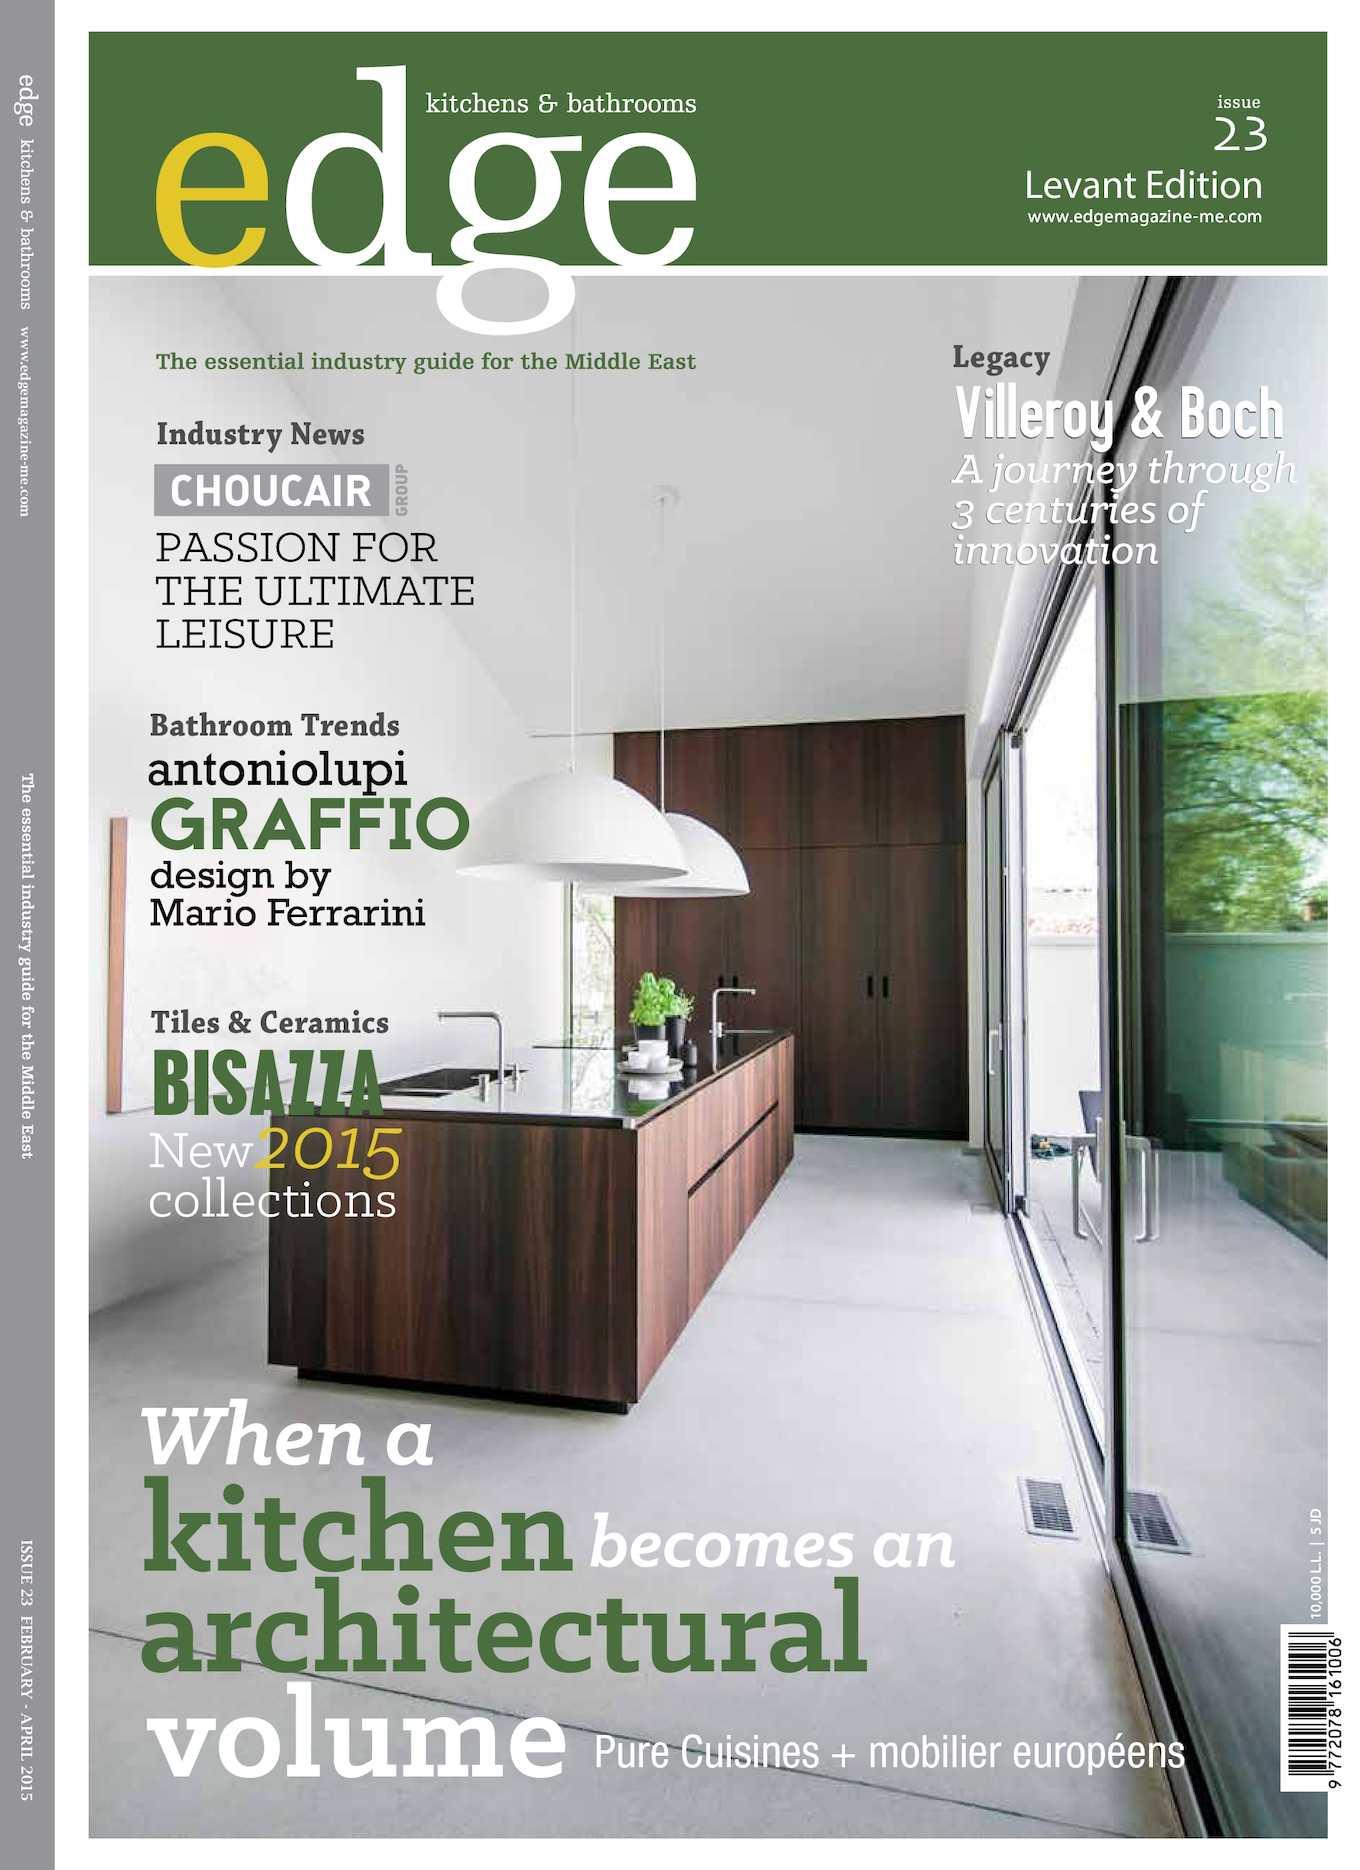 Fiore 94 Bisazza.Calameo Edge Levant Feb2015 Issue23